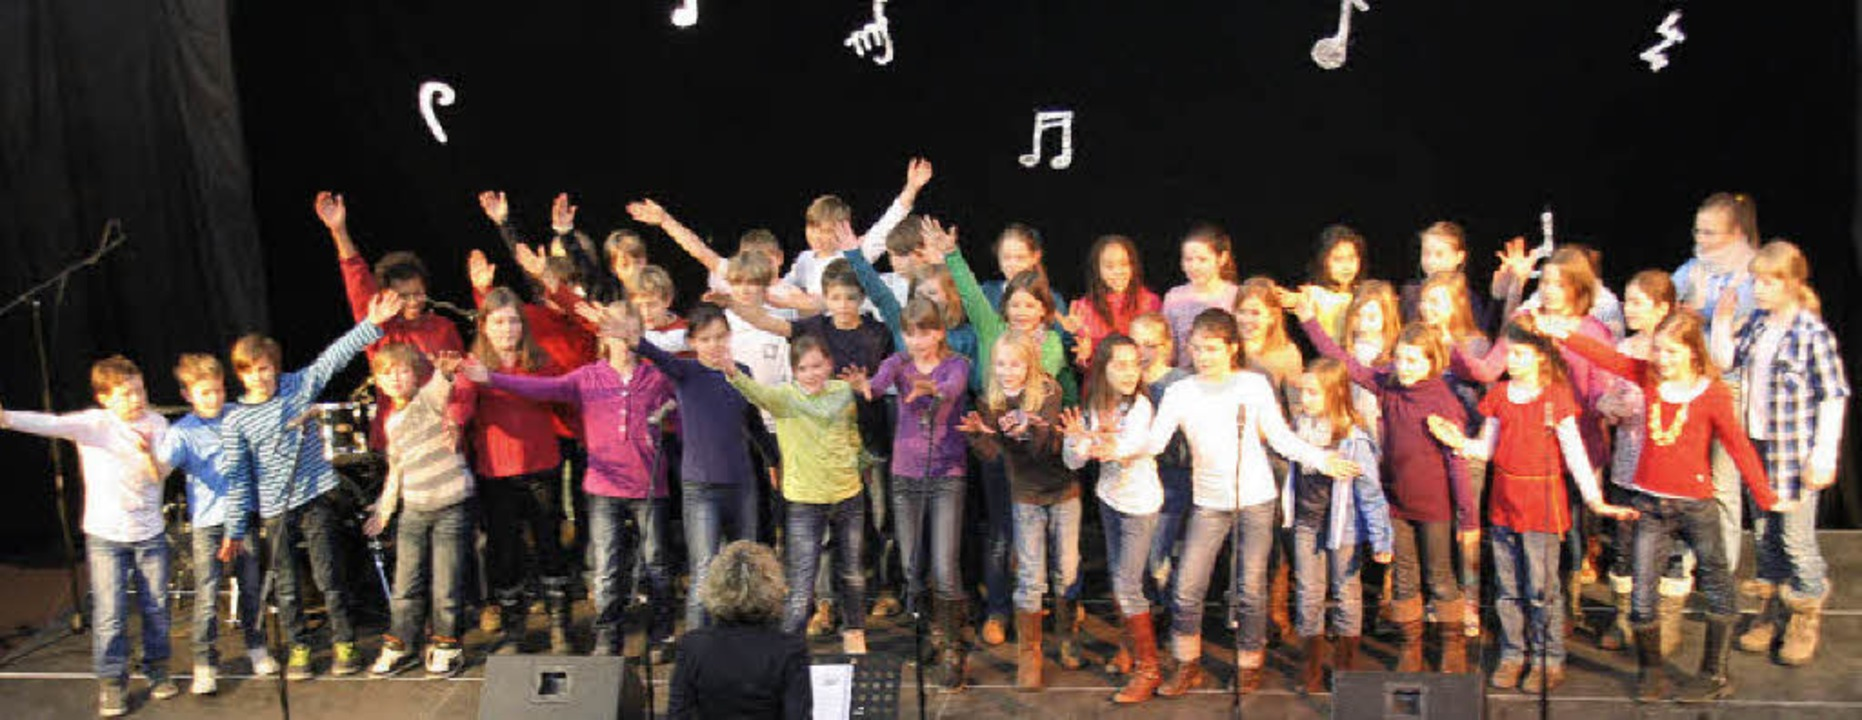 "Schule macht Musik: Die Kids waren vol...""Varieté""  in Kirchzarten.  | Foto: Hans Jürgen Kugler"